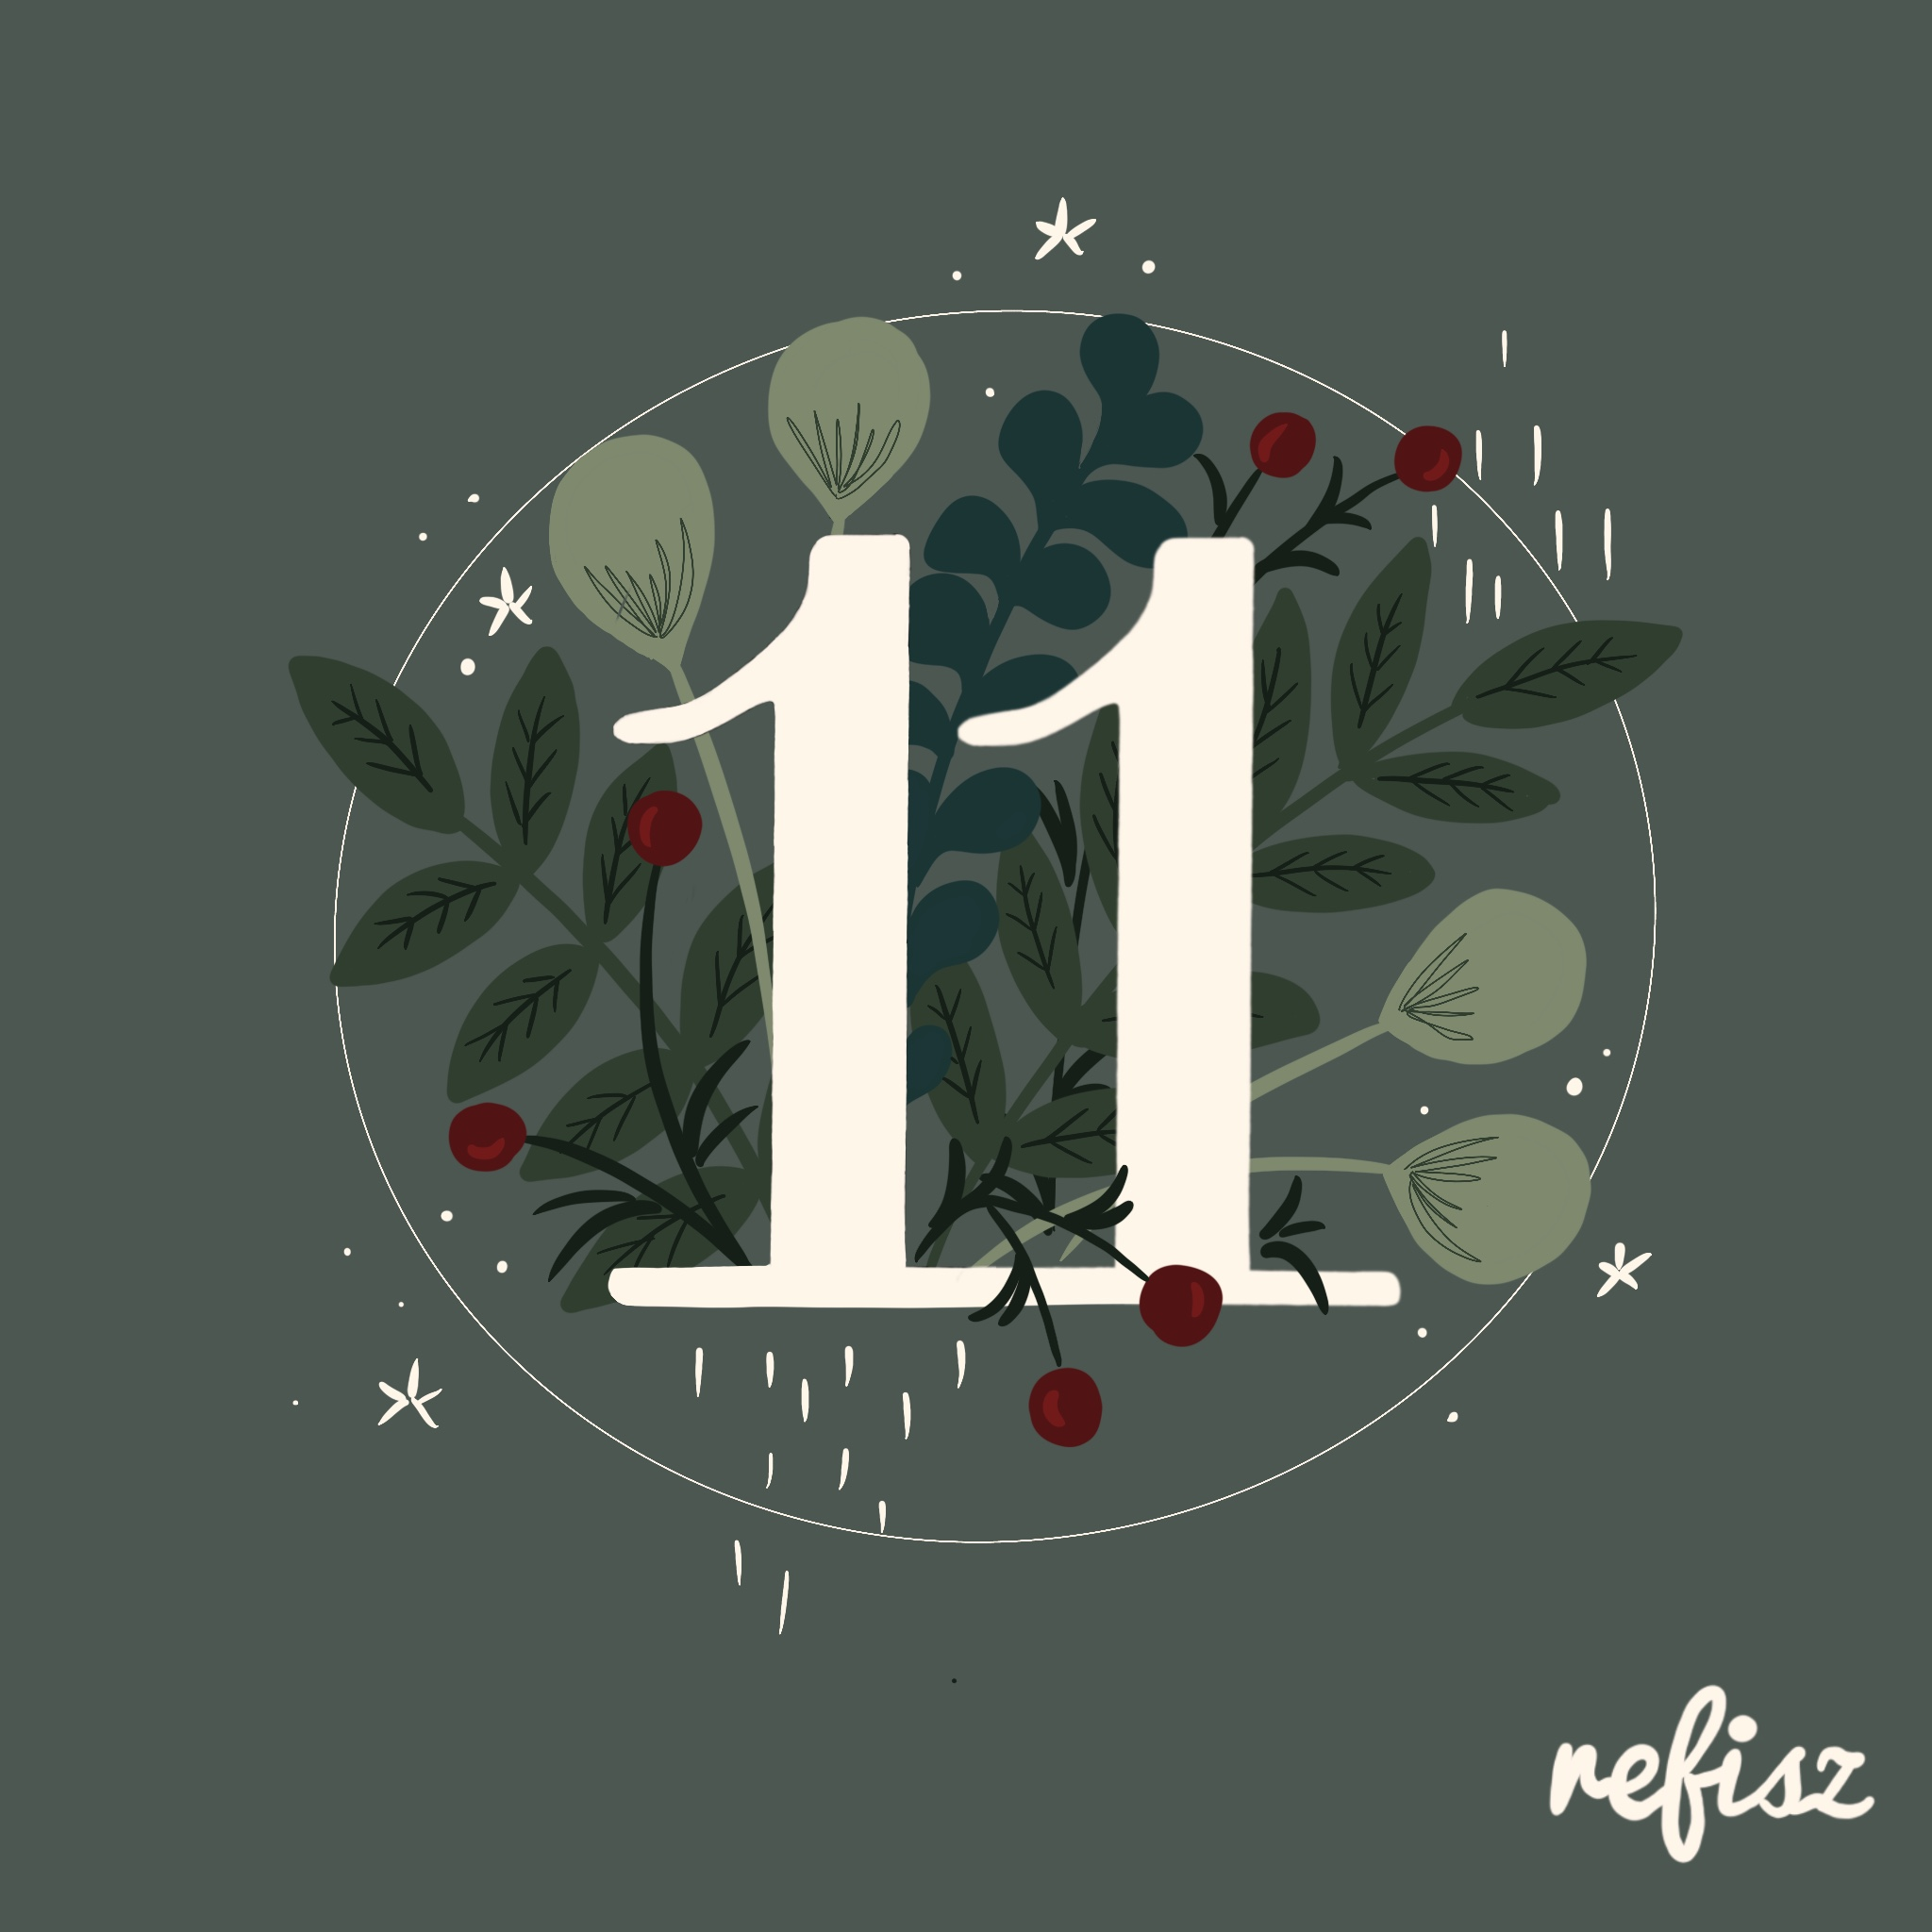 REFISZ Adventi Kalendárium 2020. december 11.